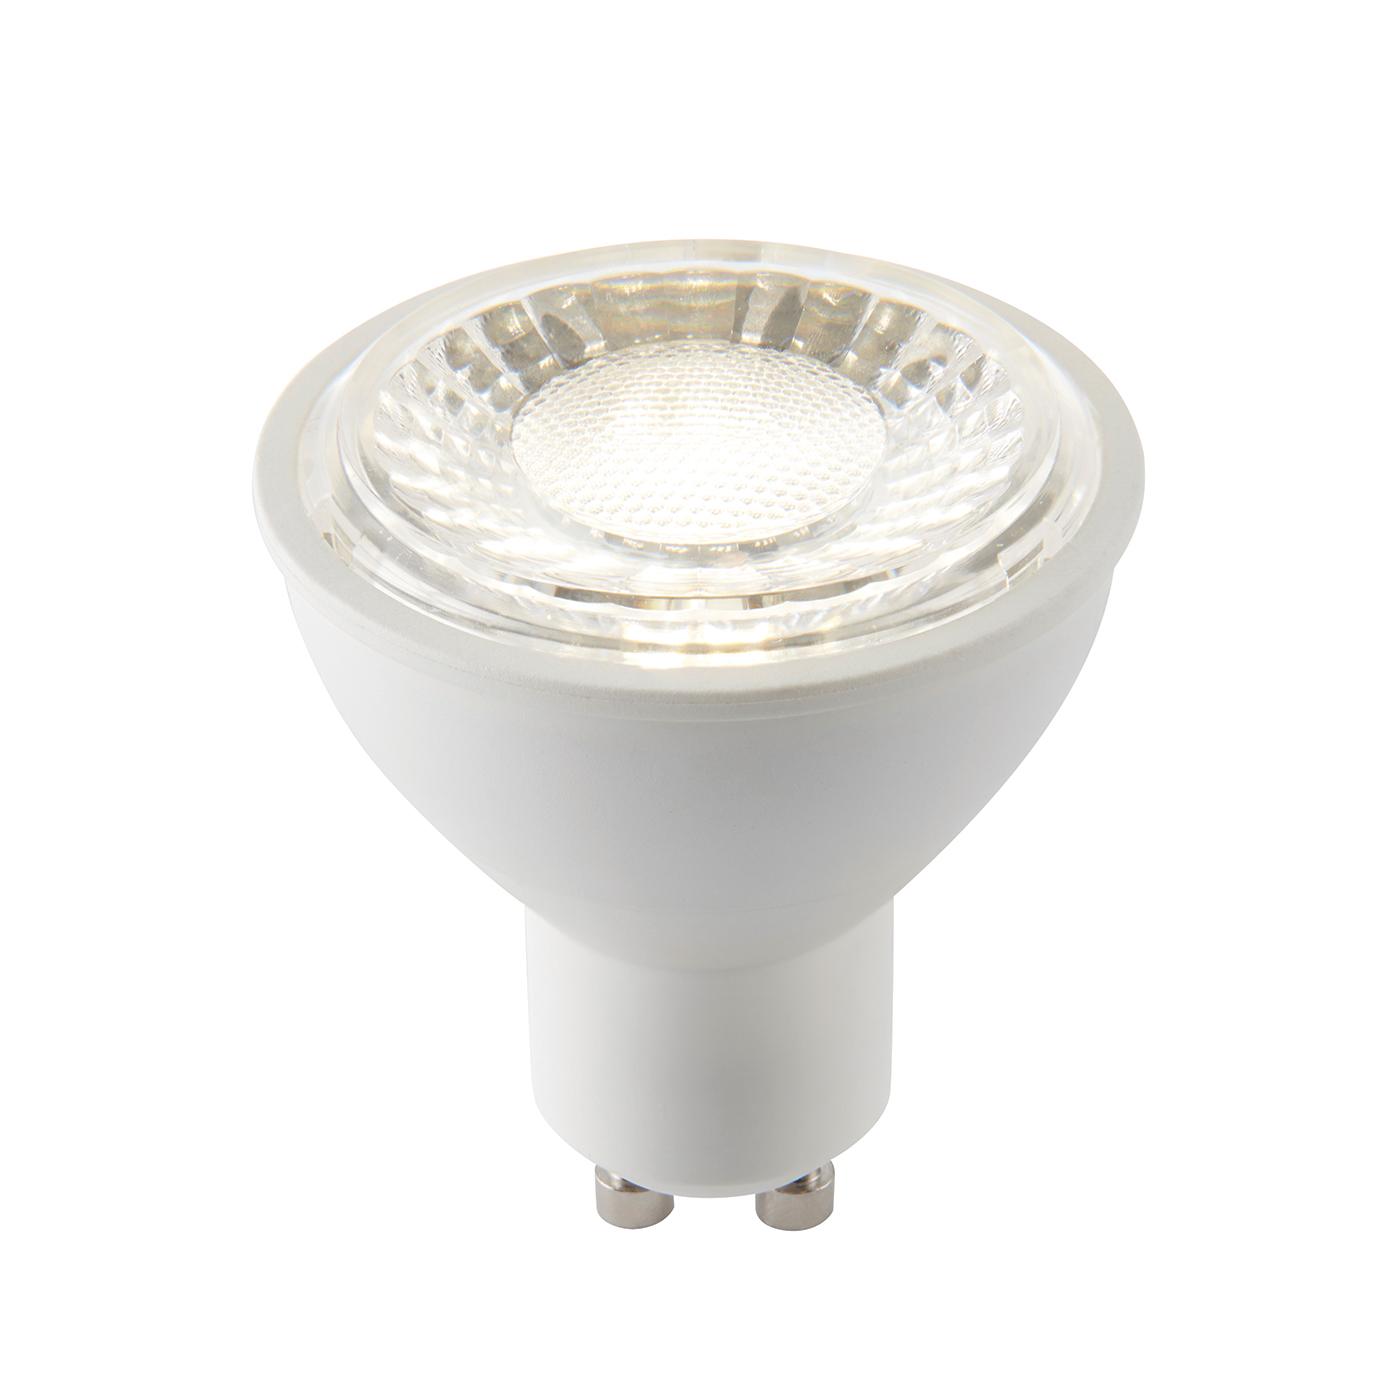 Endon 70052 LED SMD Lamp 4000K GU10 6W